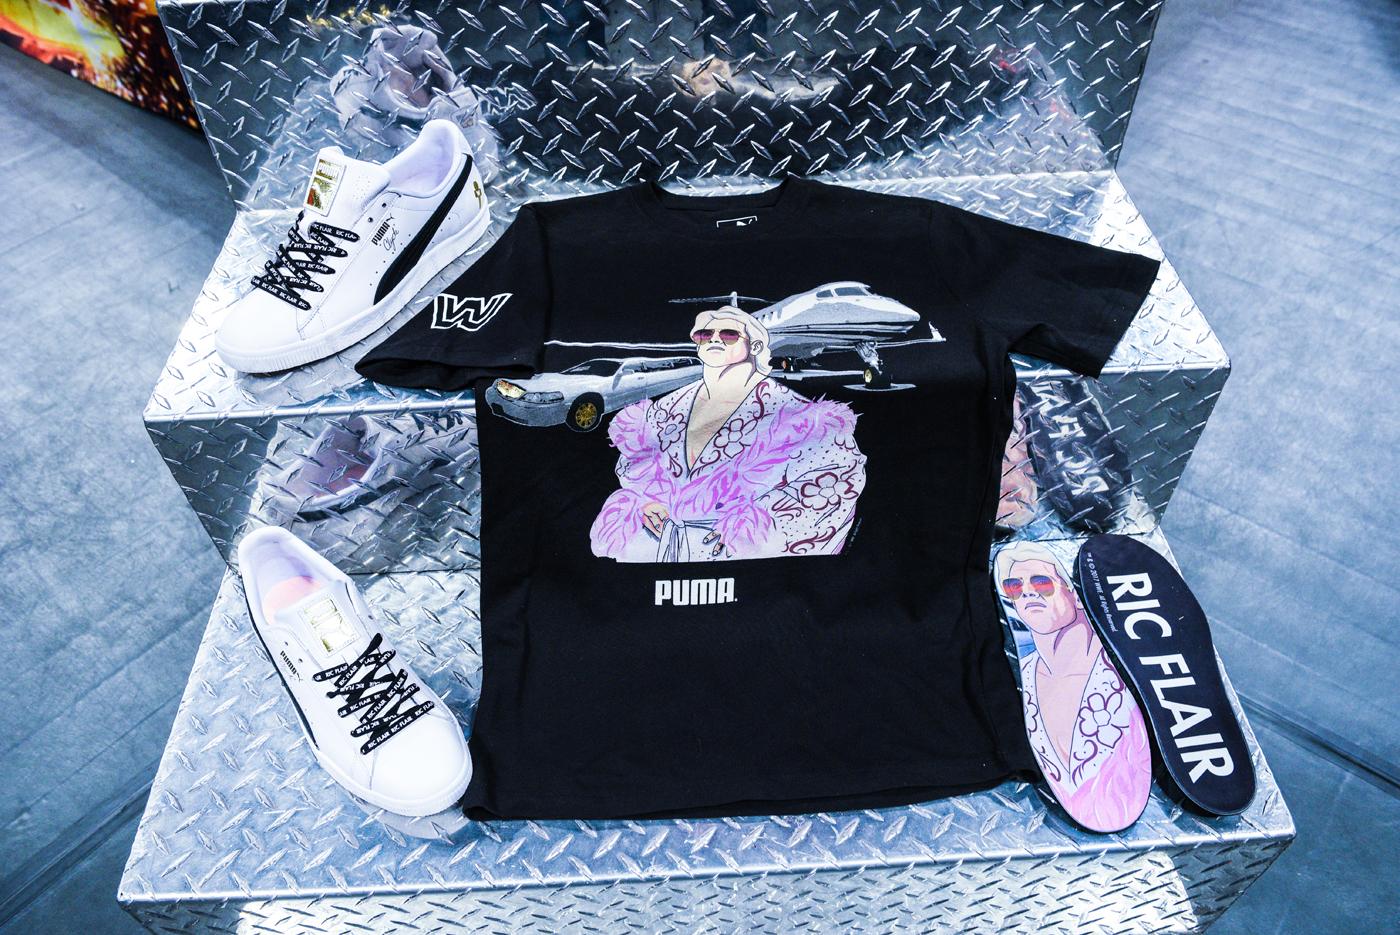 Foot Locker WWE - Flair Shirt and Shoes